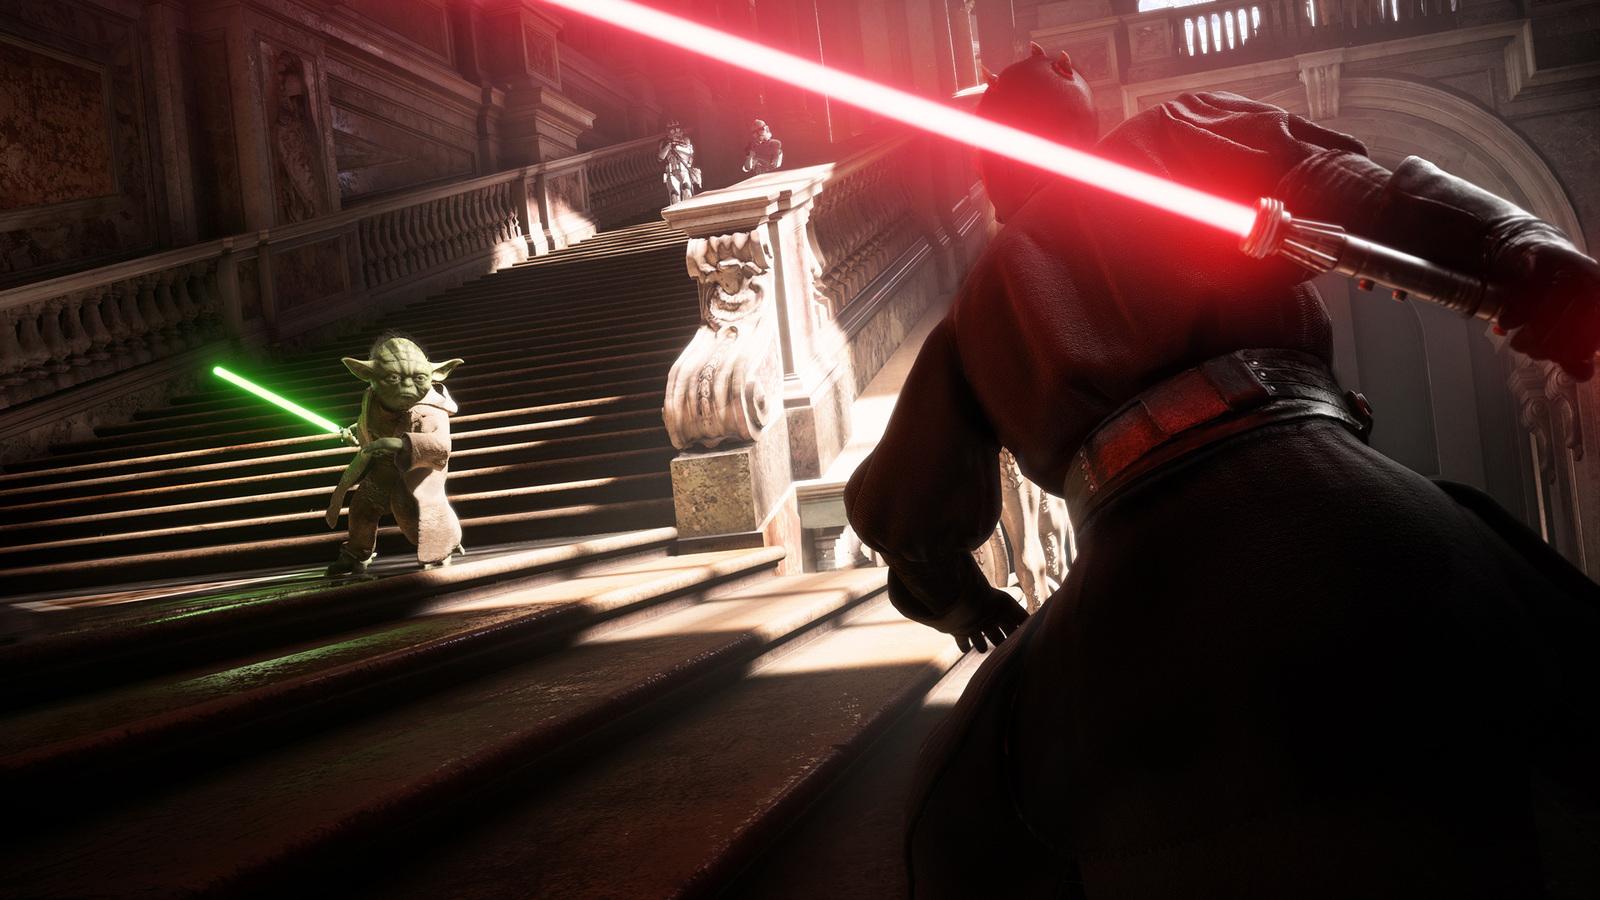 1600x900 Yoda Vs Darth Vader Star Wars Battlefront 2 1600x900